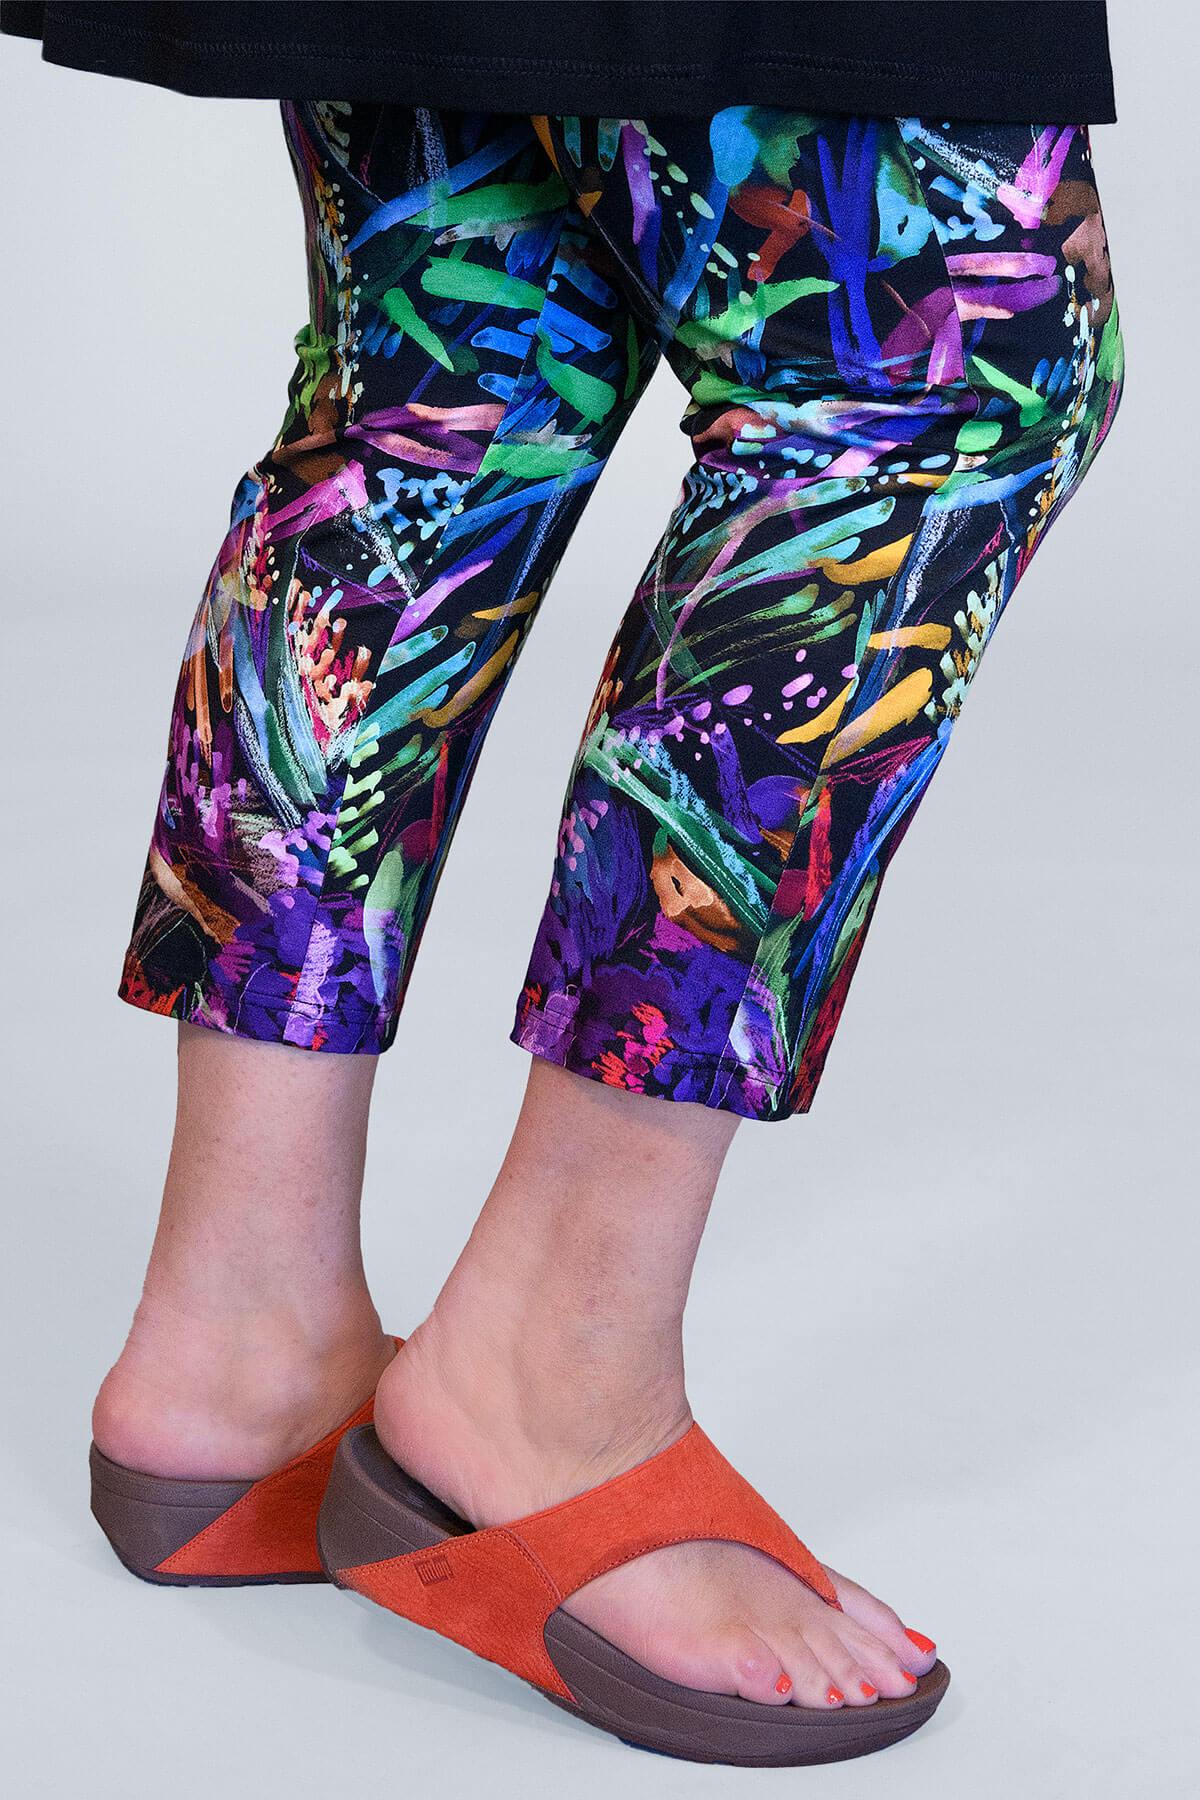 Doris Streich floral crop leggings